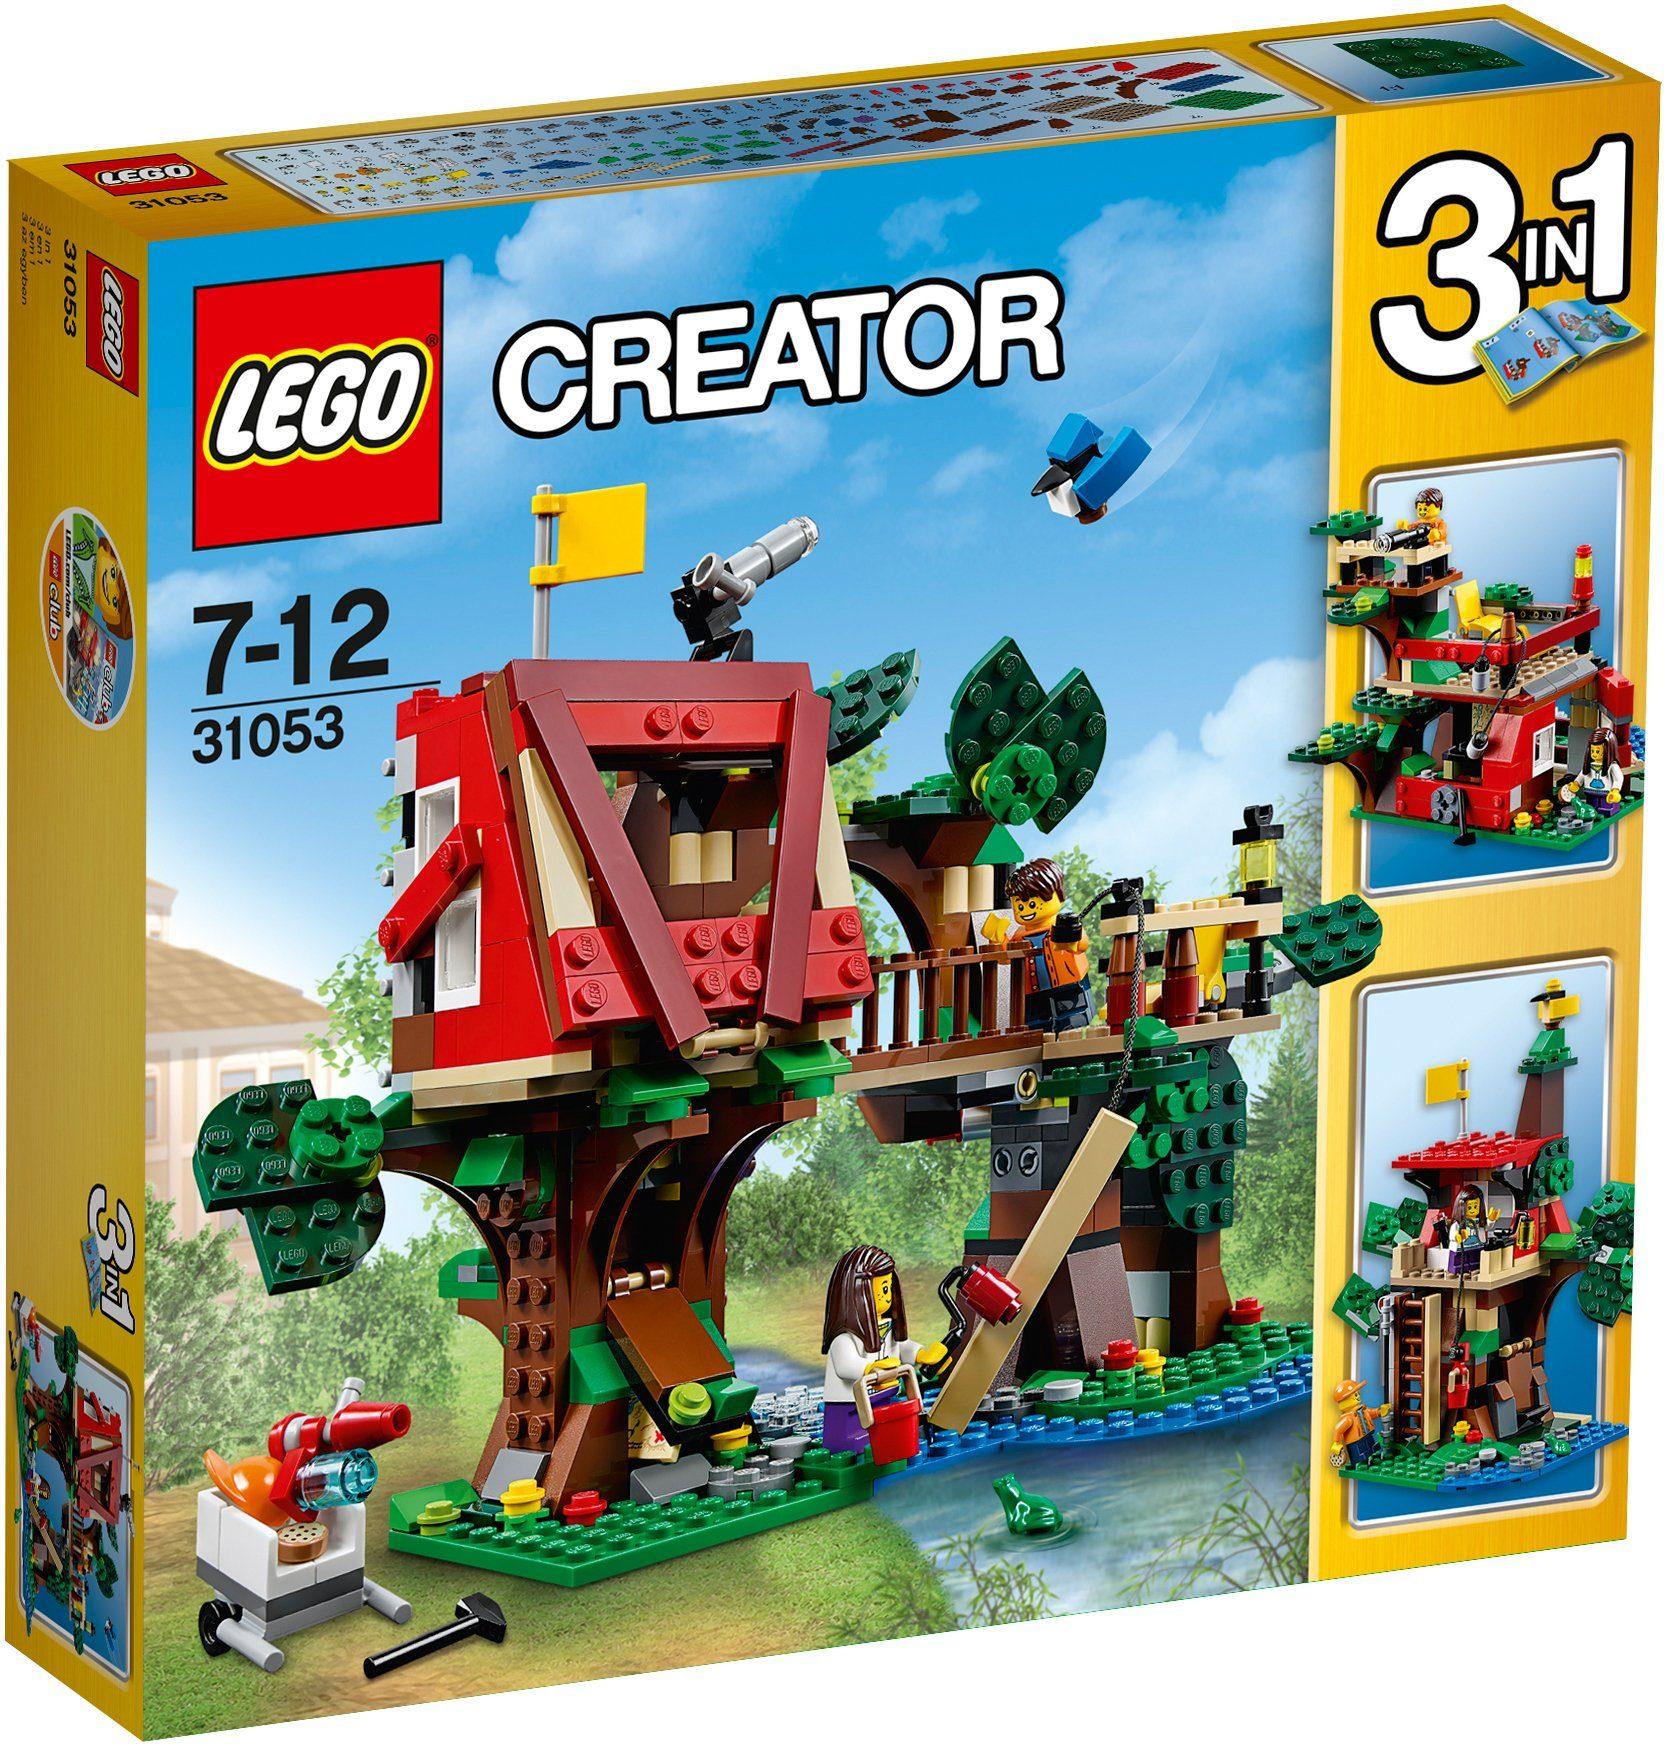 LEGO®, 3in1 Baumhausabenteuer (31053), »LEGO® Creator«